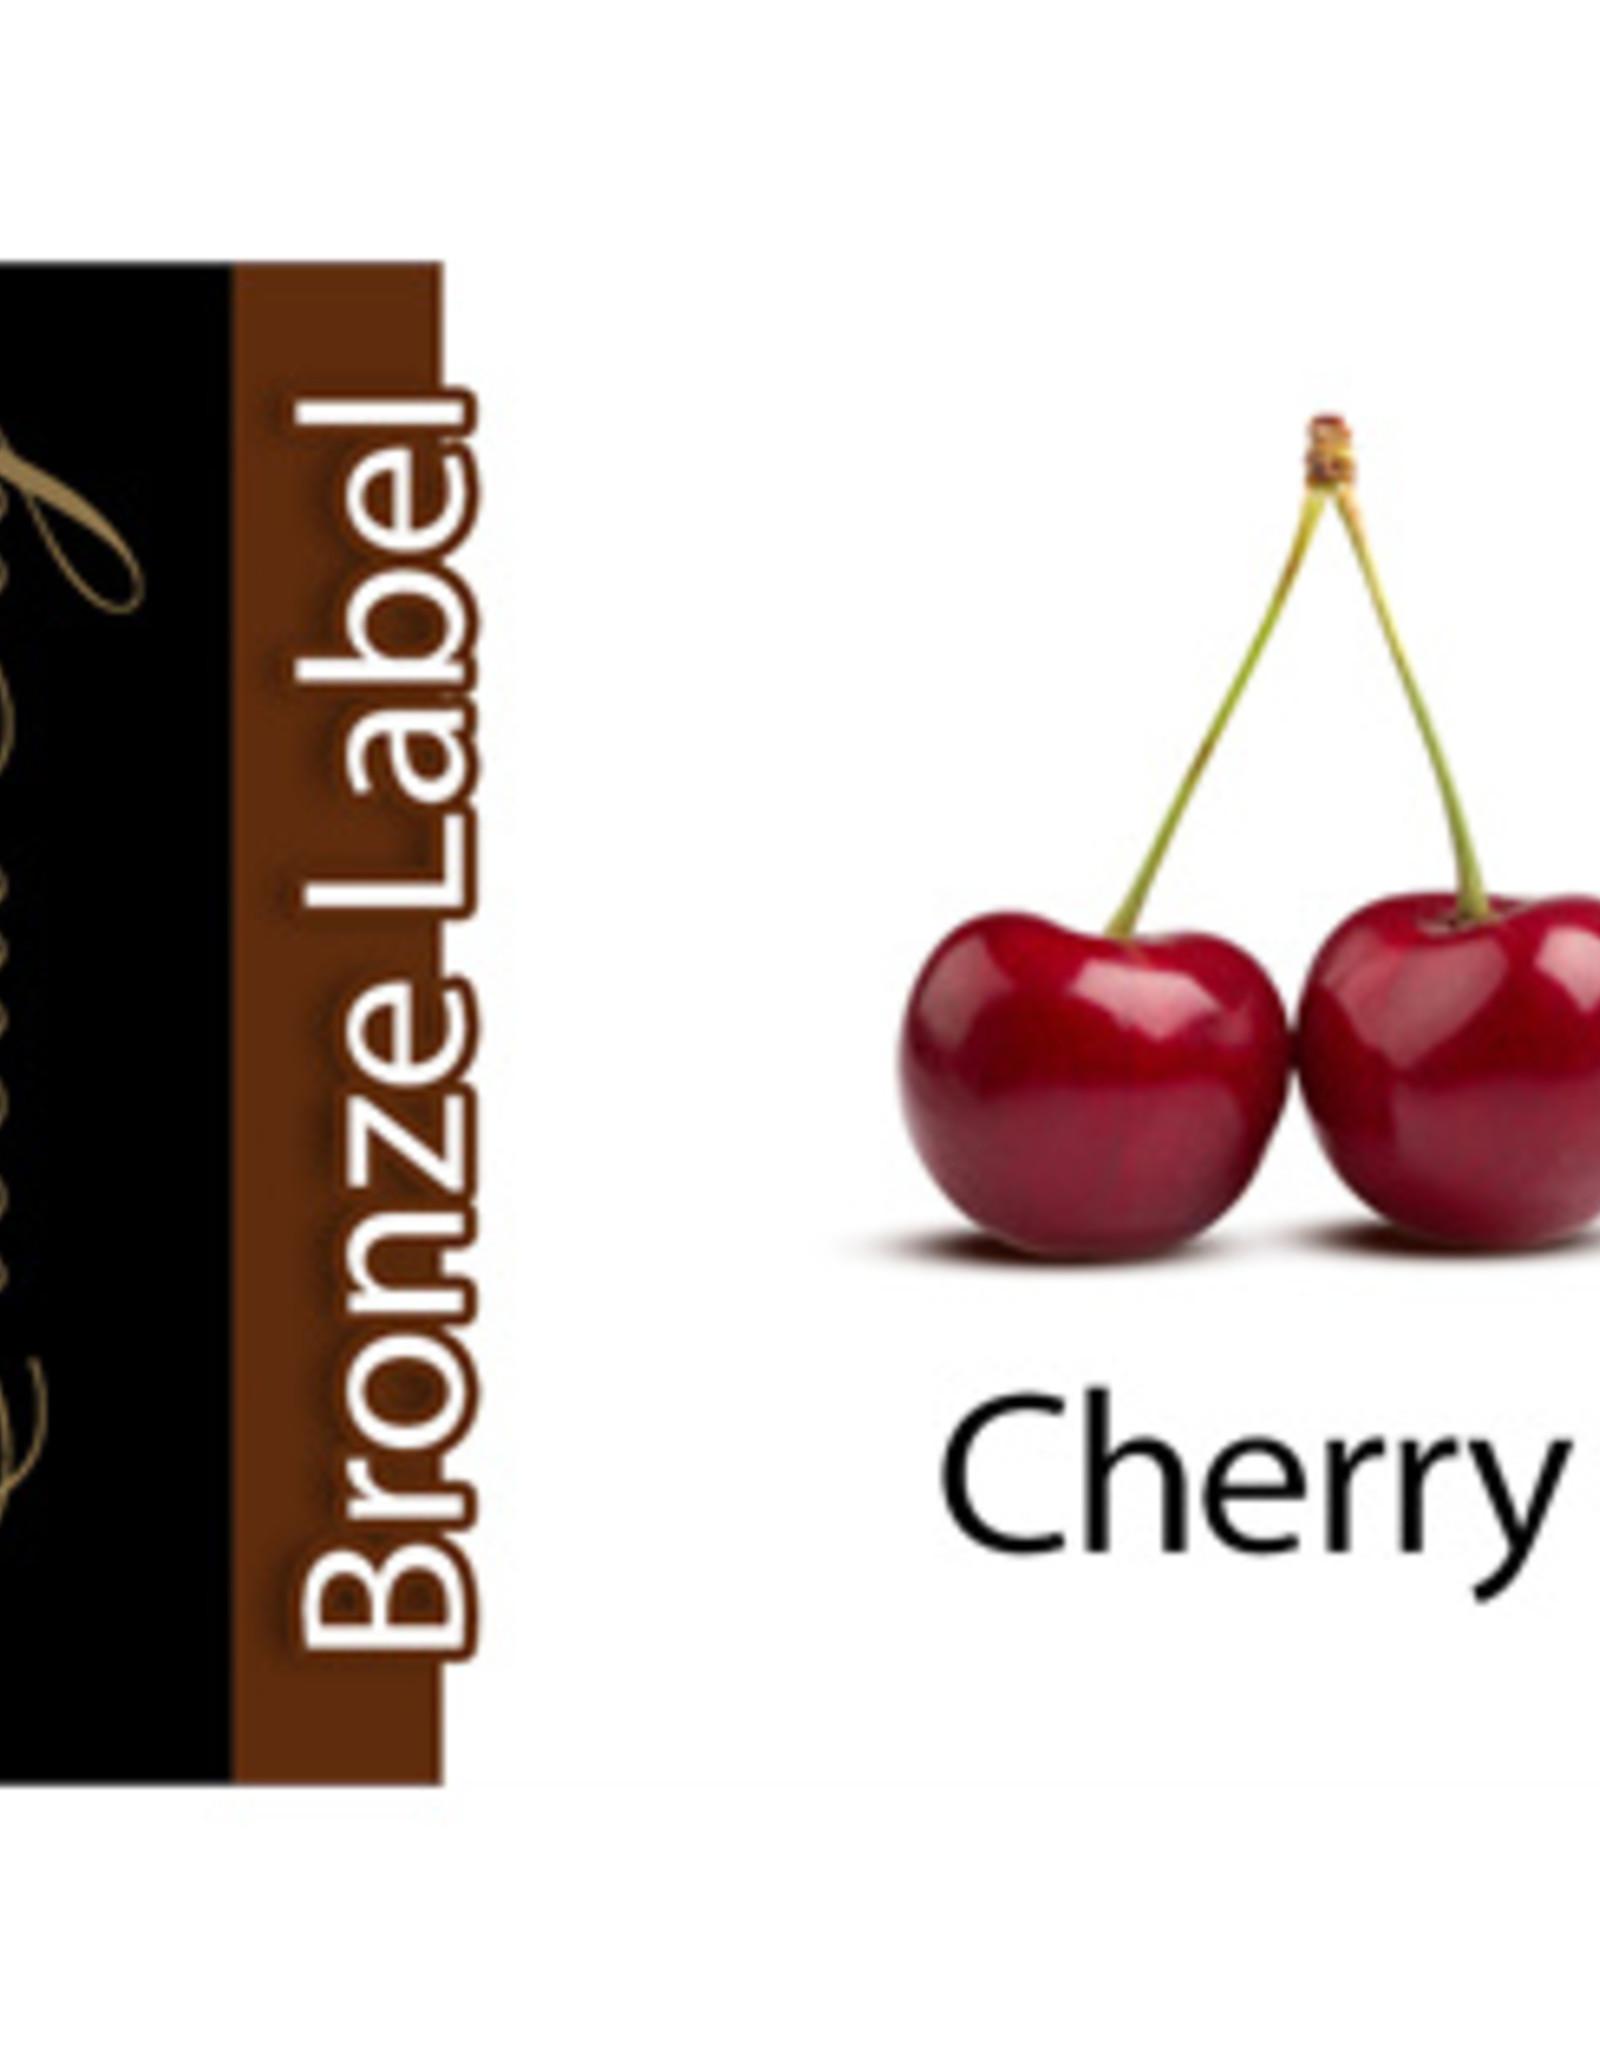 Exclucig Exclucig Bronze Label E-liquid Cherry 18 mg Nicotine